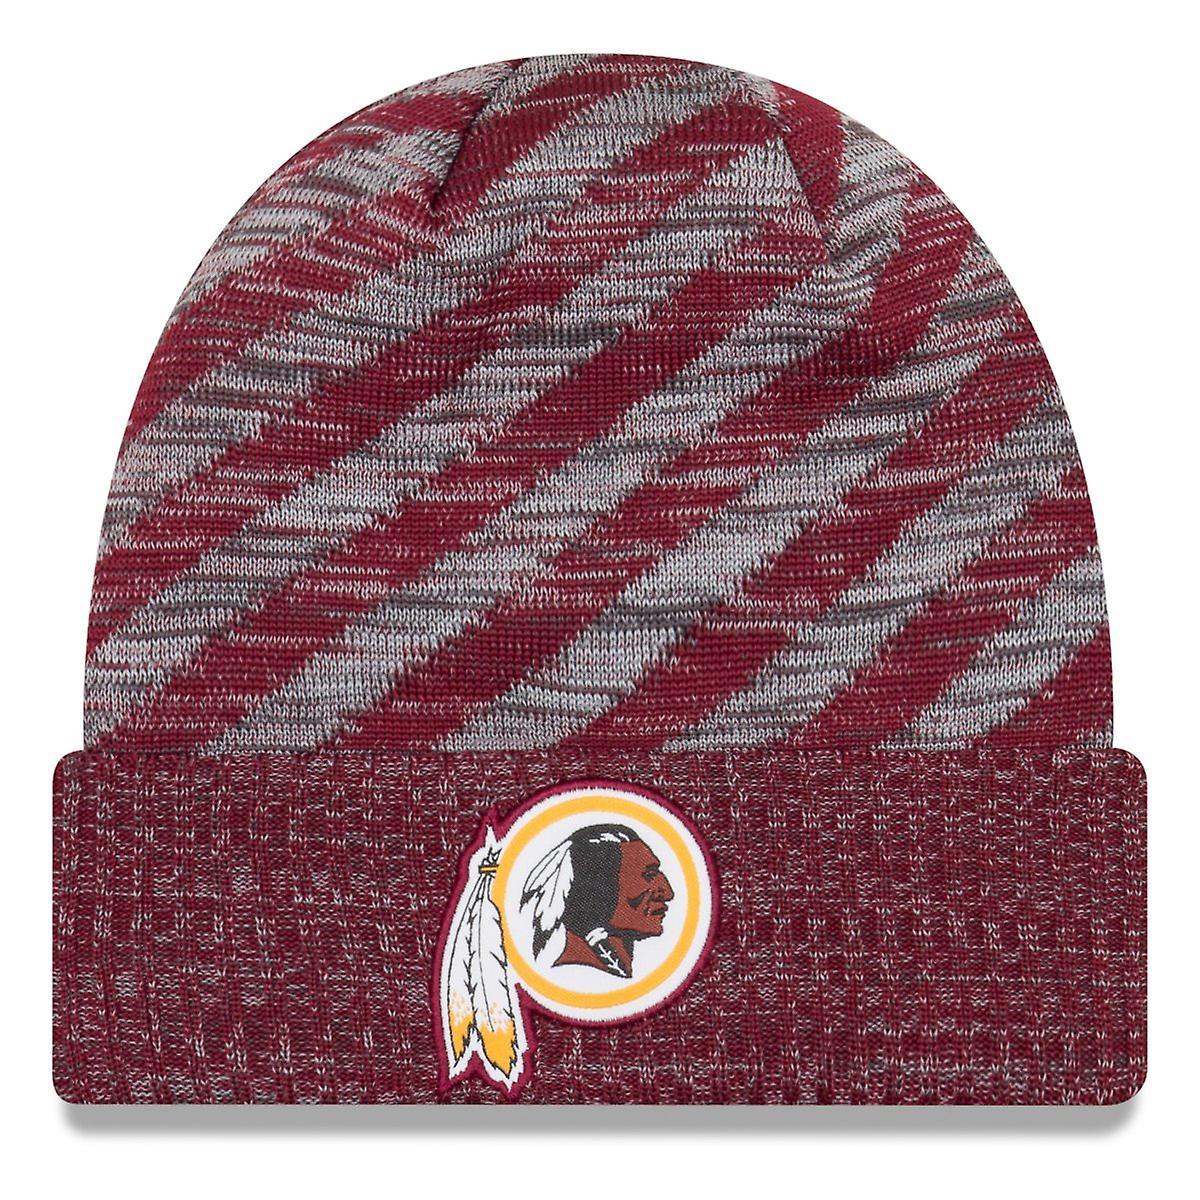 d27c935c New era NFL sideline 2018 knit hat - Washington Redskins